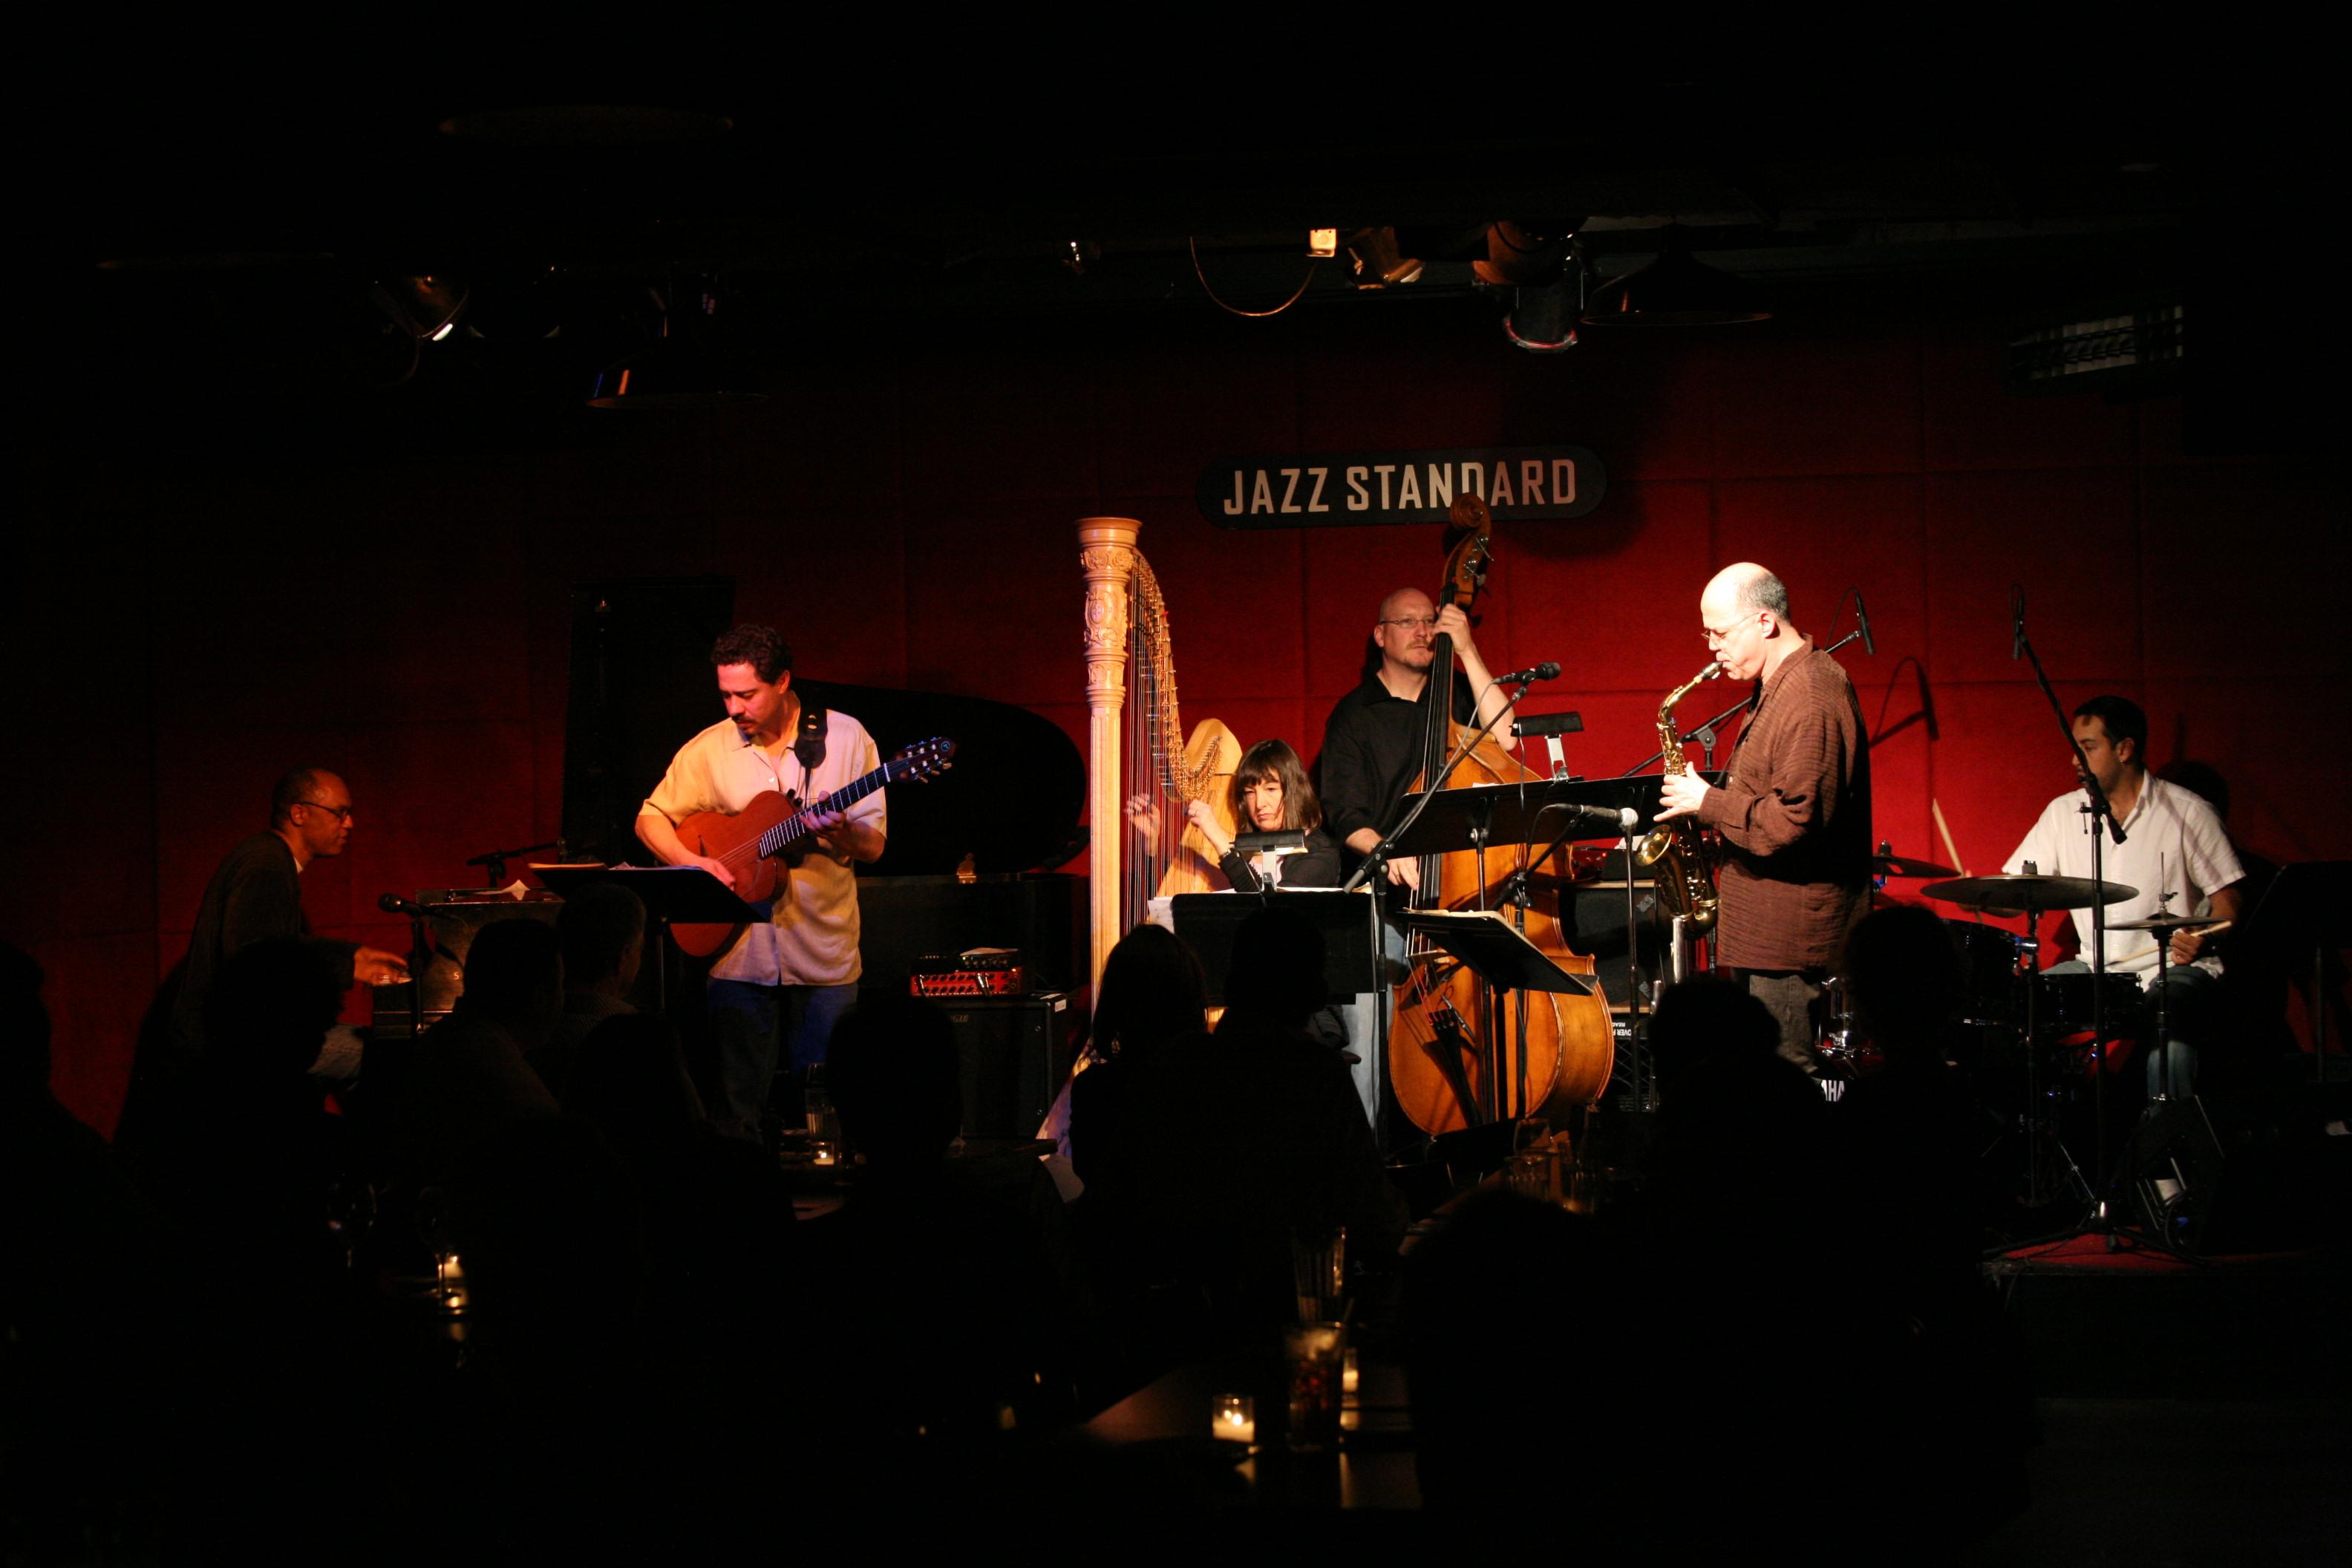 Billy Childs Jazz-Chamber Ensemble at Jazz Standard New York April 2006